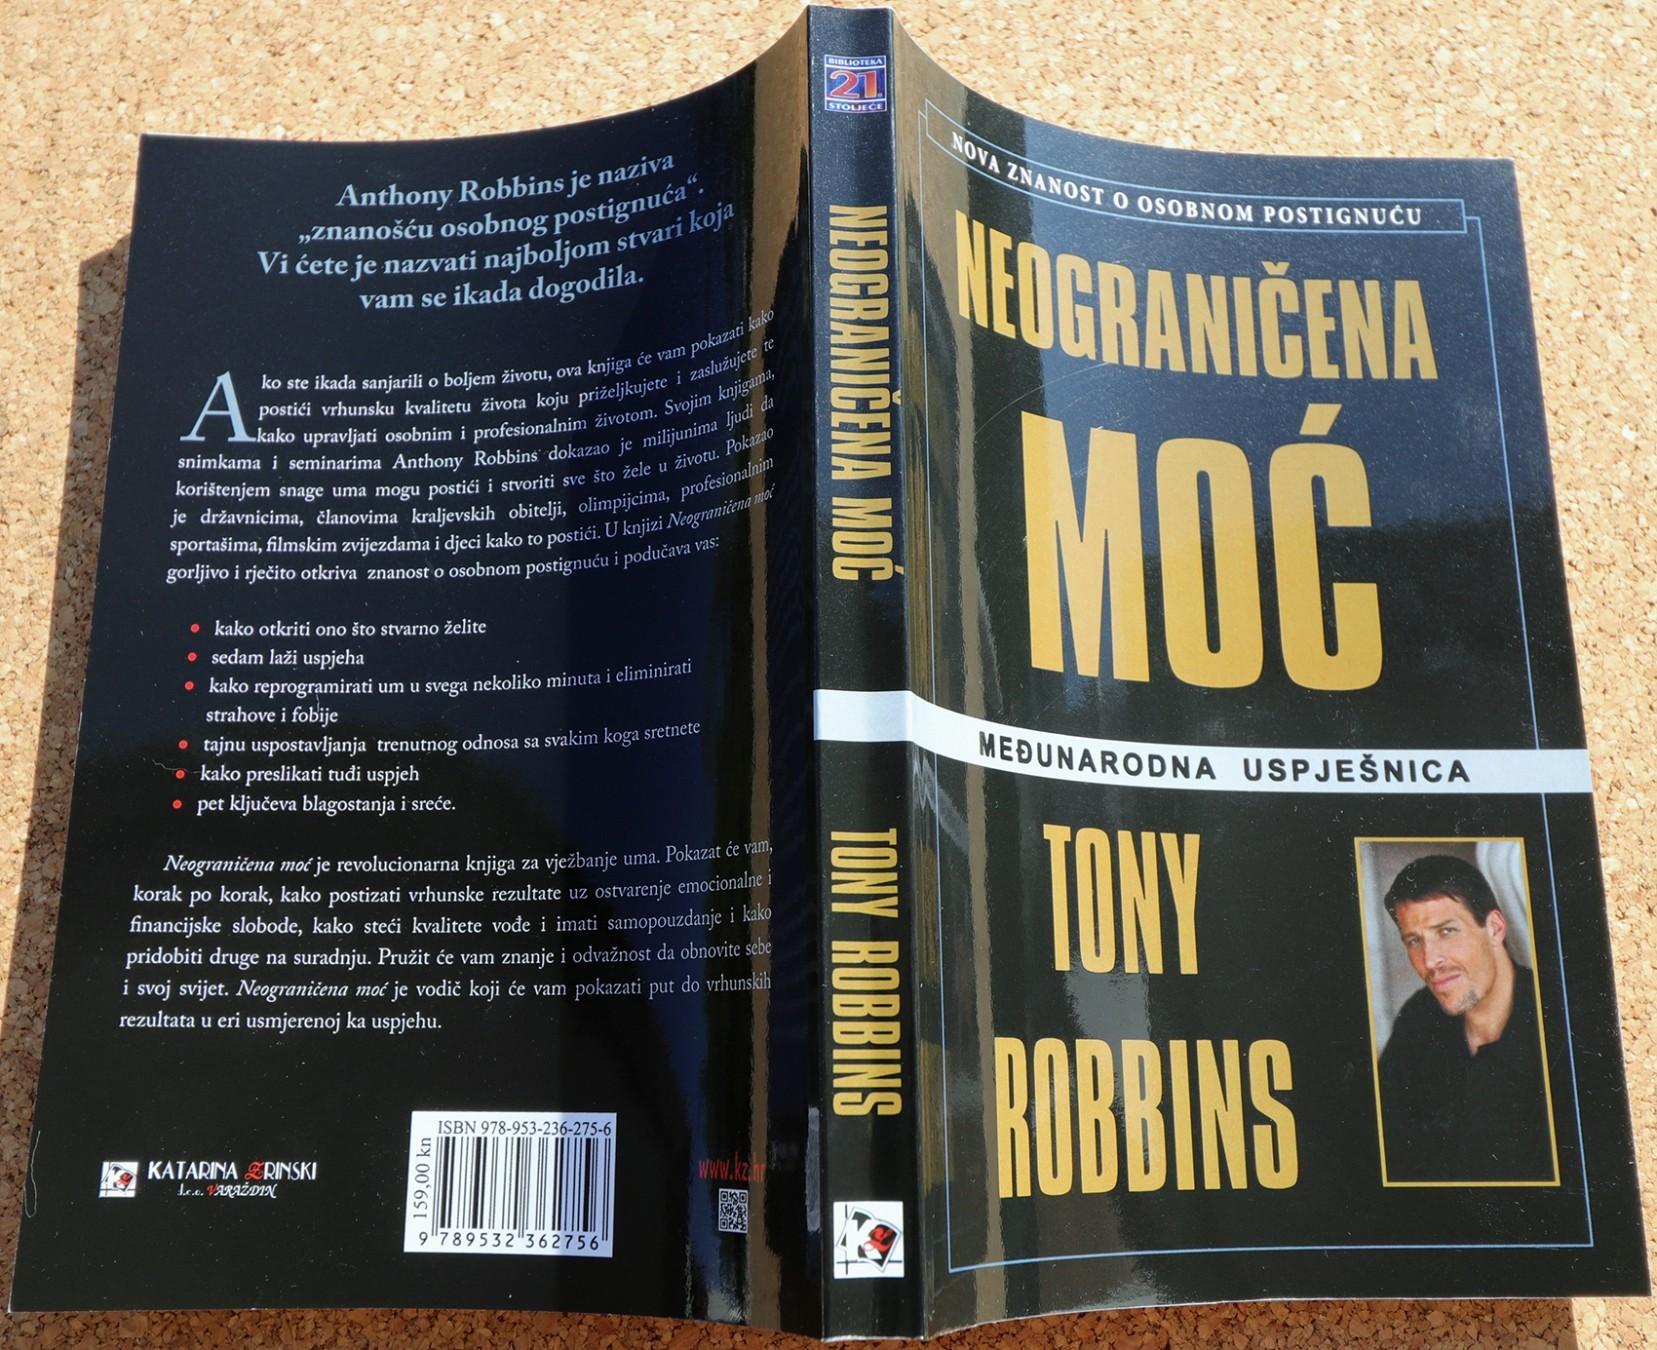 Tony robbins online upoznavanje